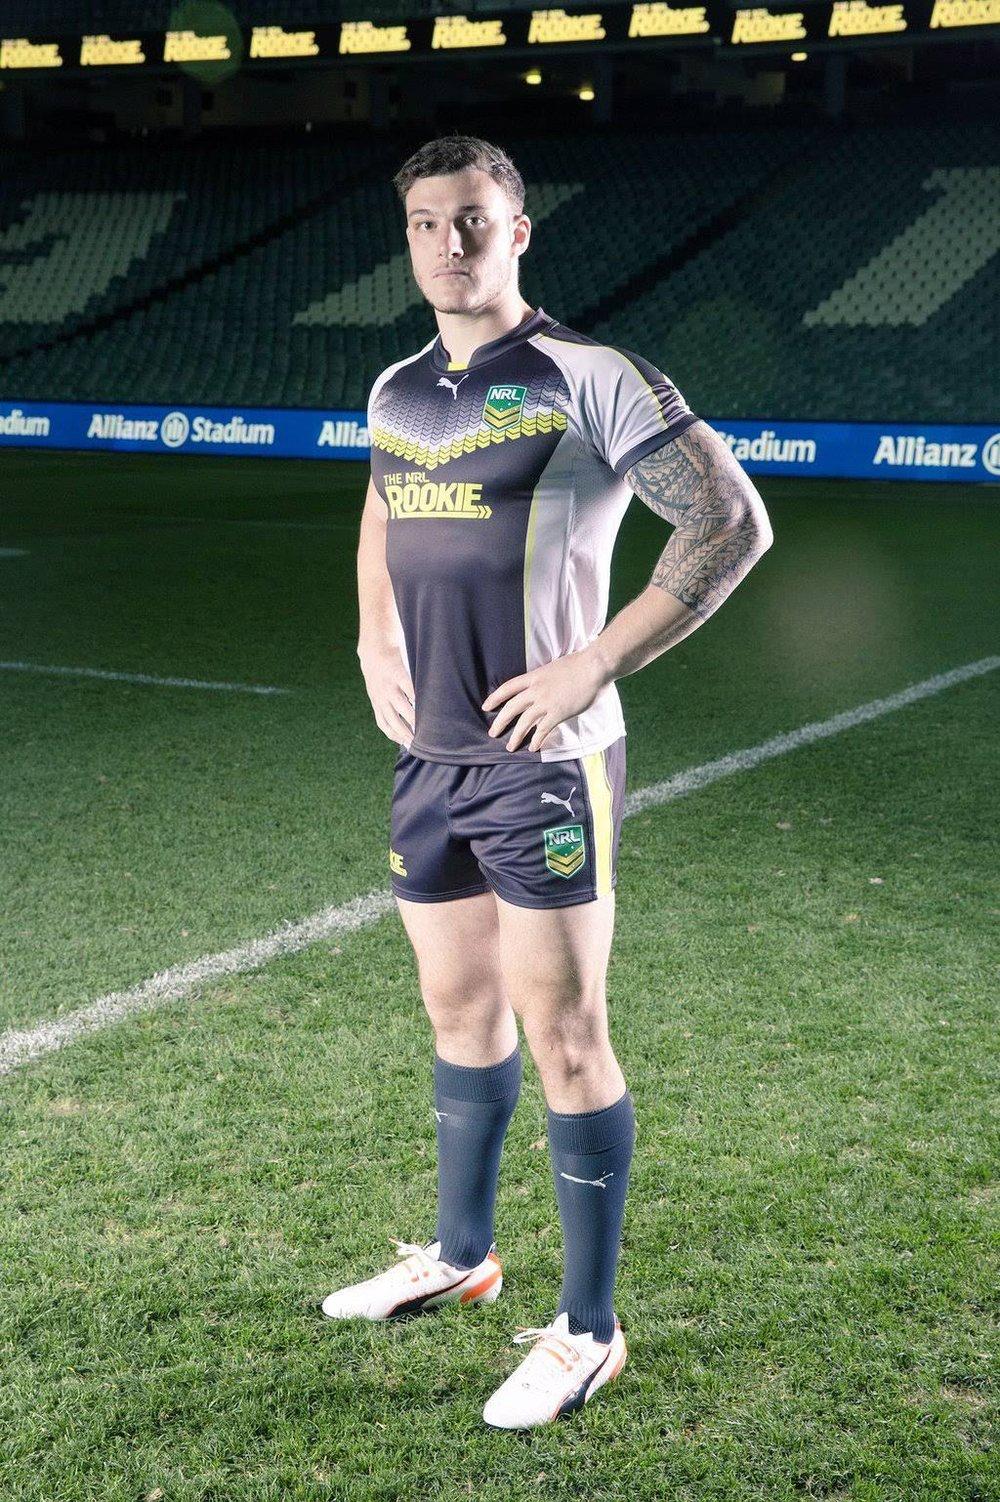 Luke Frixou on the NRL Rookie Show in Australia